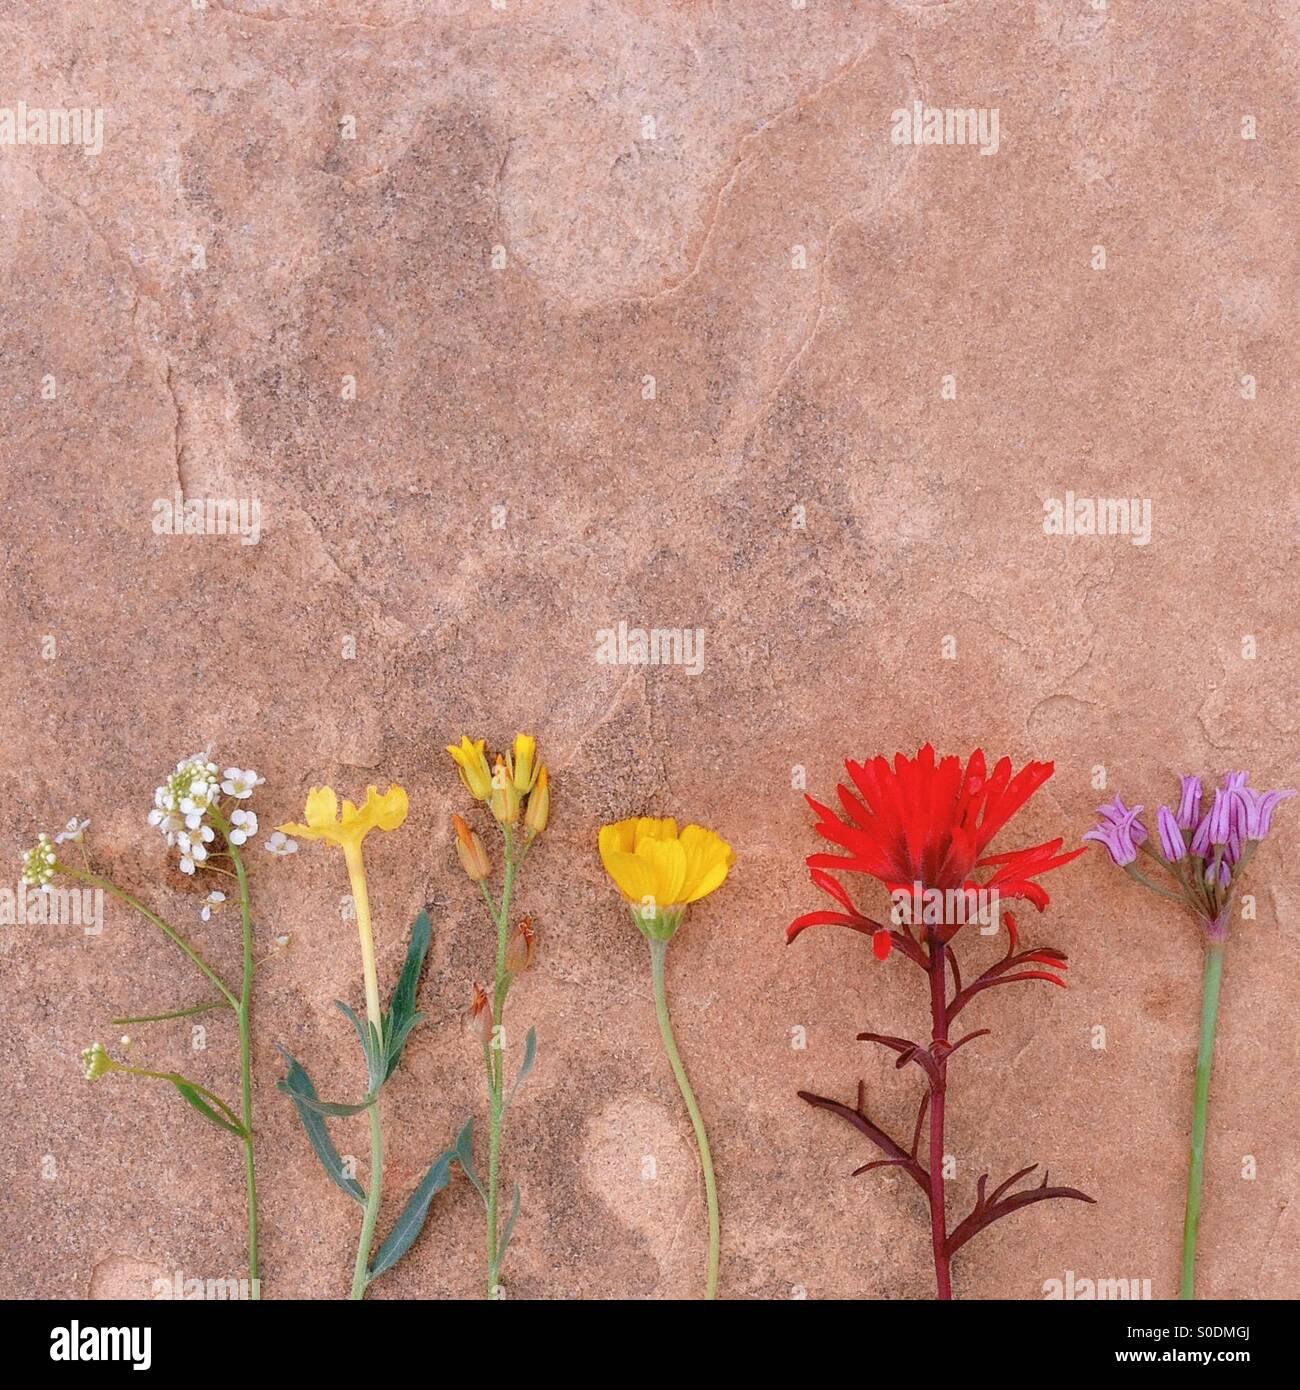 Flora del desierto Imagen De Stock